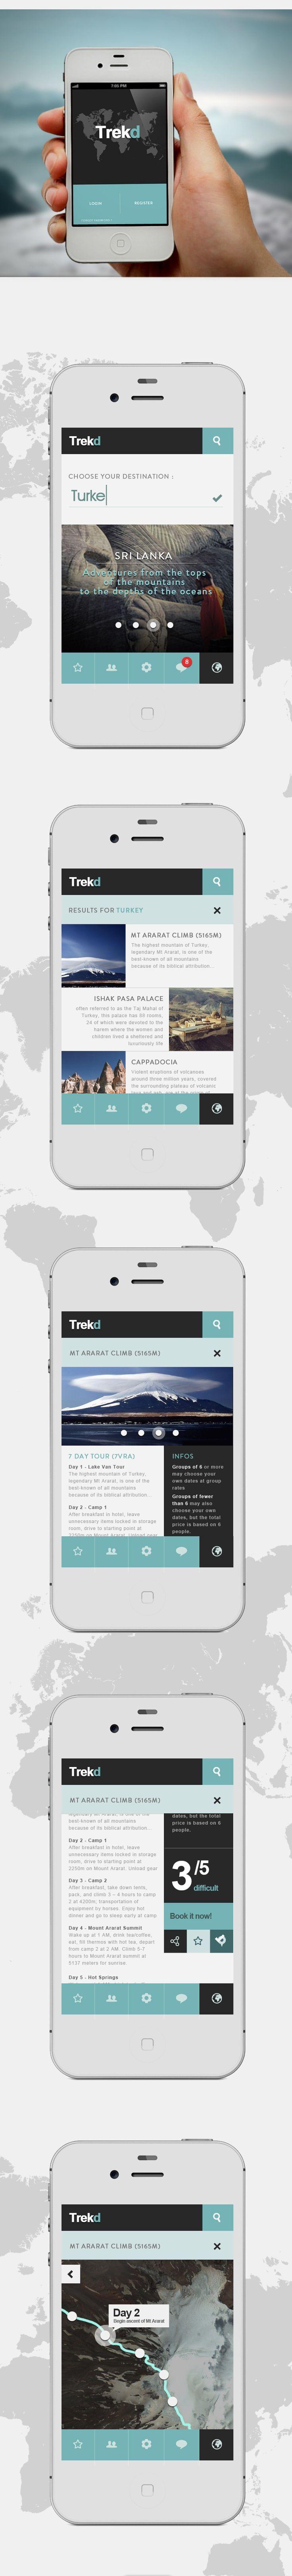 Trekd (app concept) | Designer: Thomas Le Corre - Watch Create Short Meaningful Videos via Gloopt. https://itunes.apple.com/us/app/gloopt/id885729225